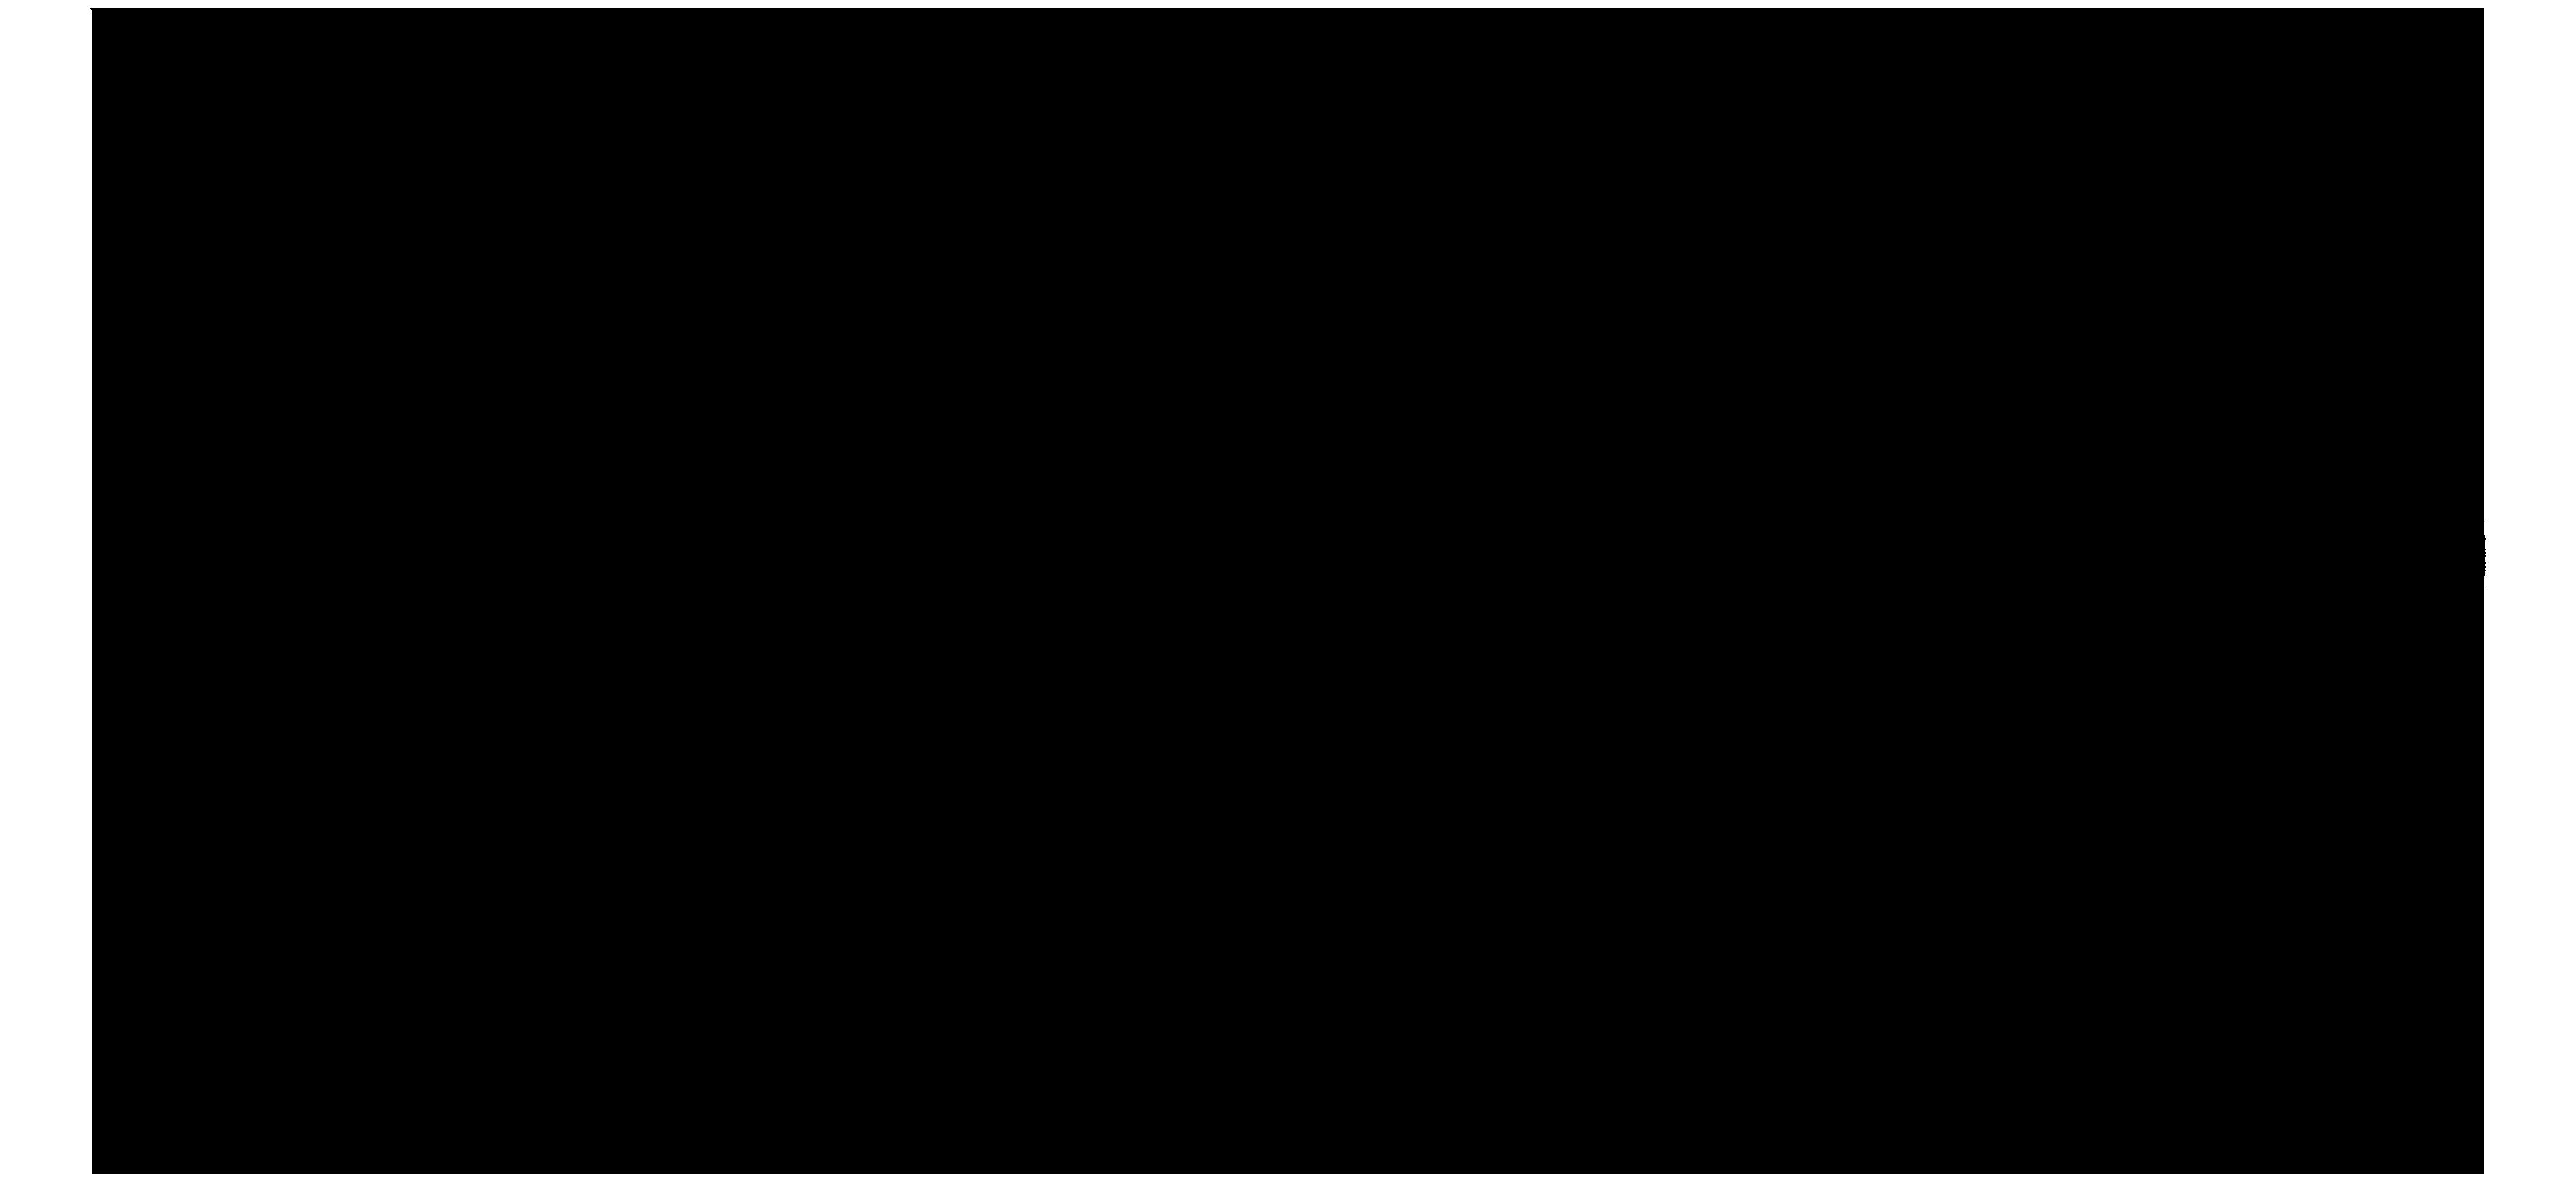 Plegados y Manufacturas YAGÜE